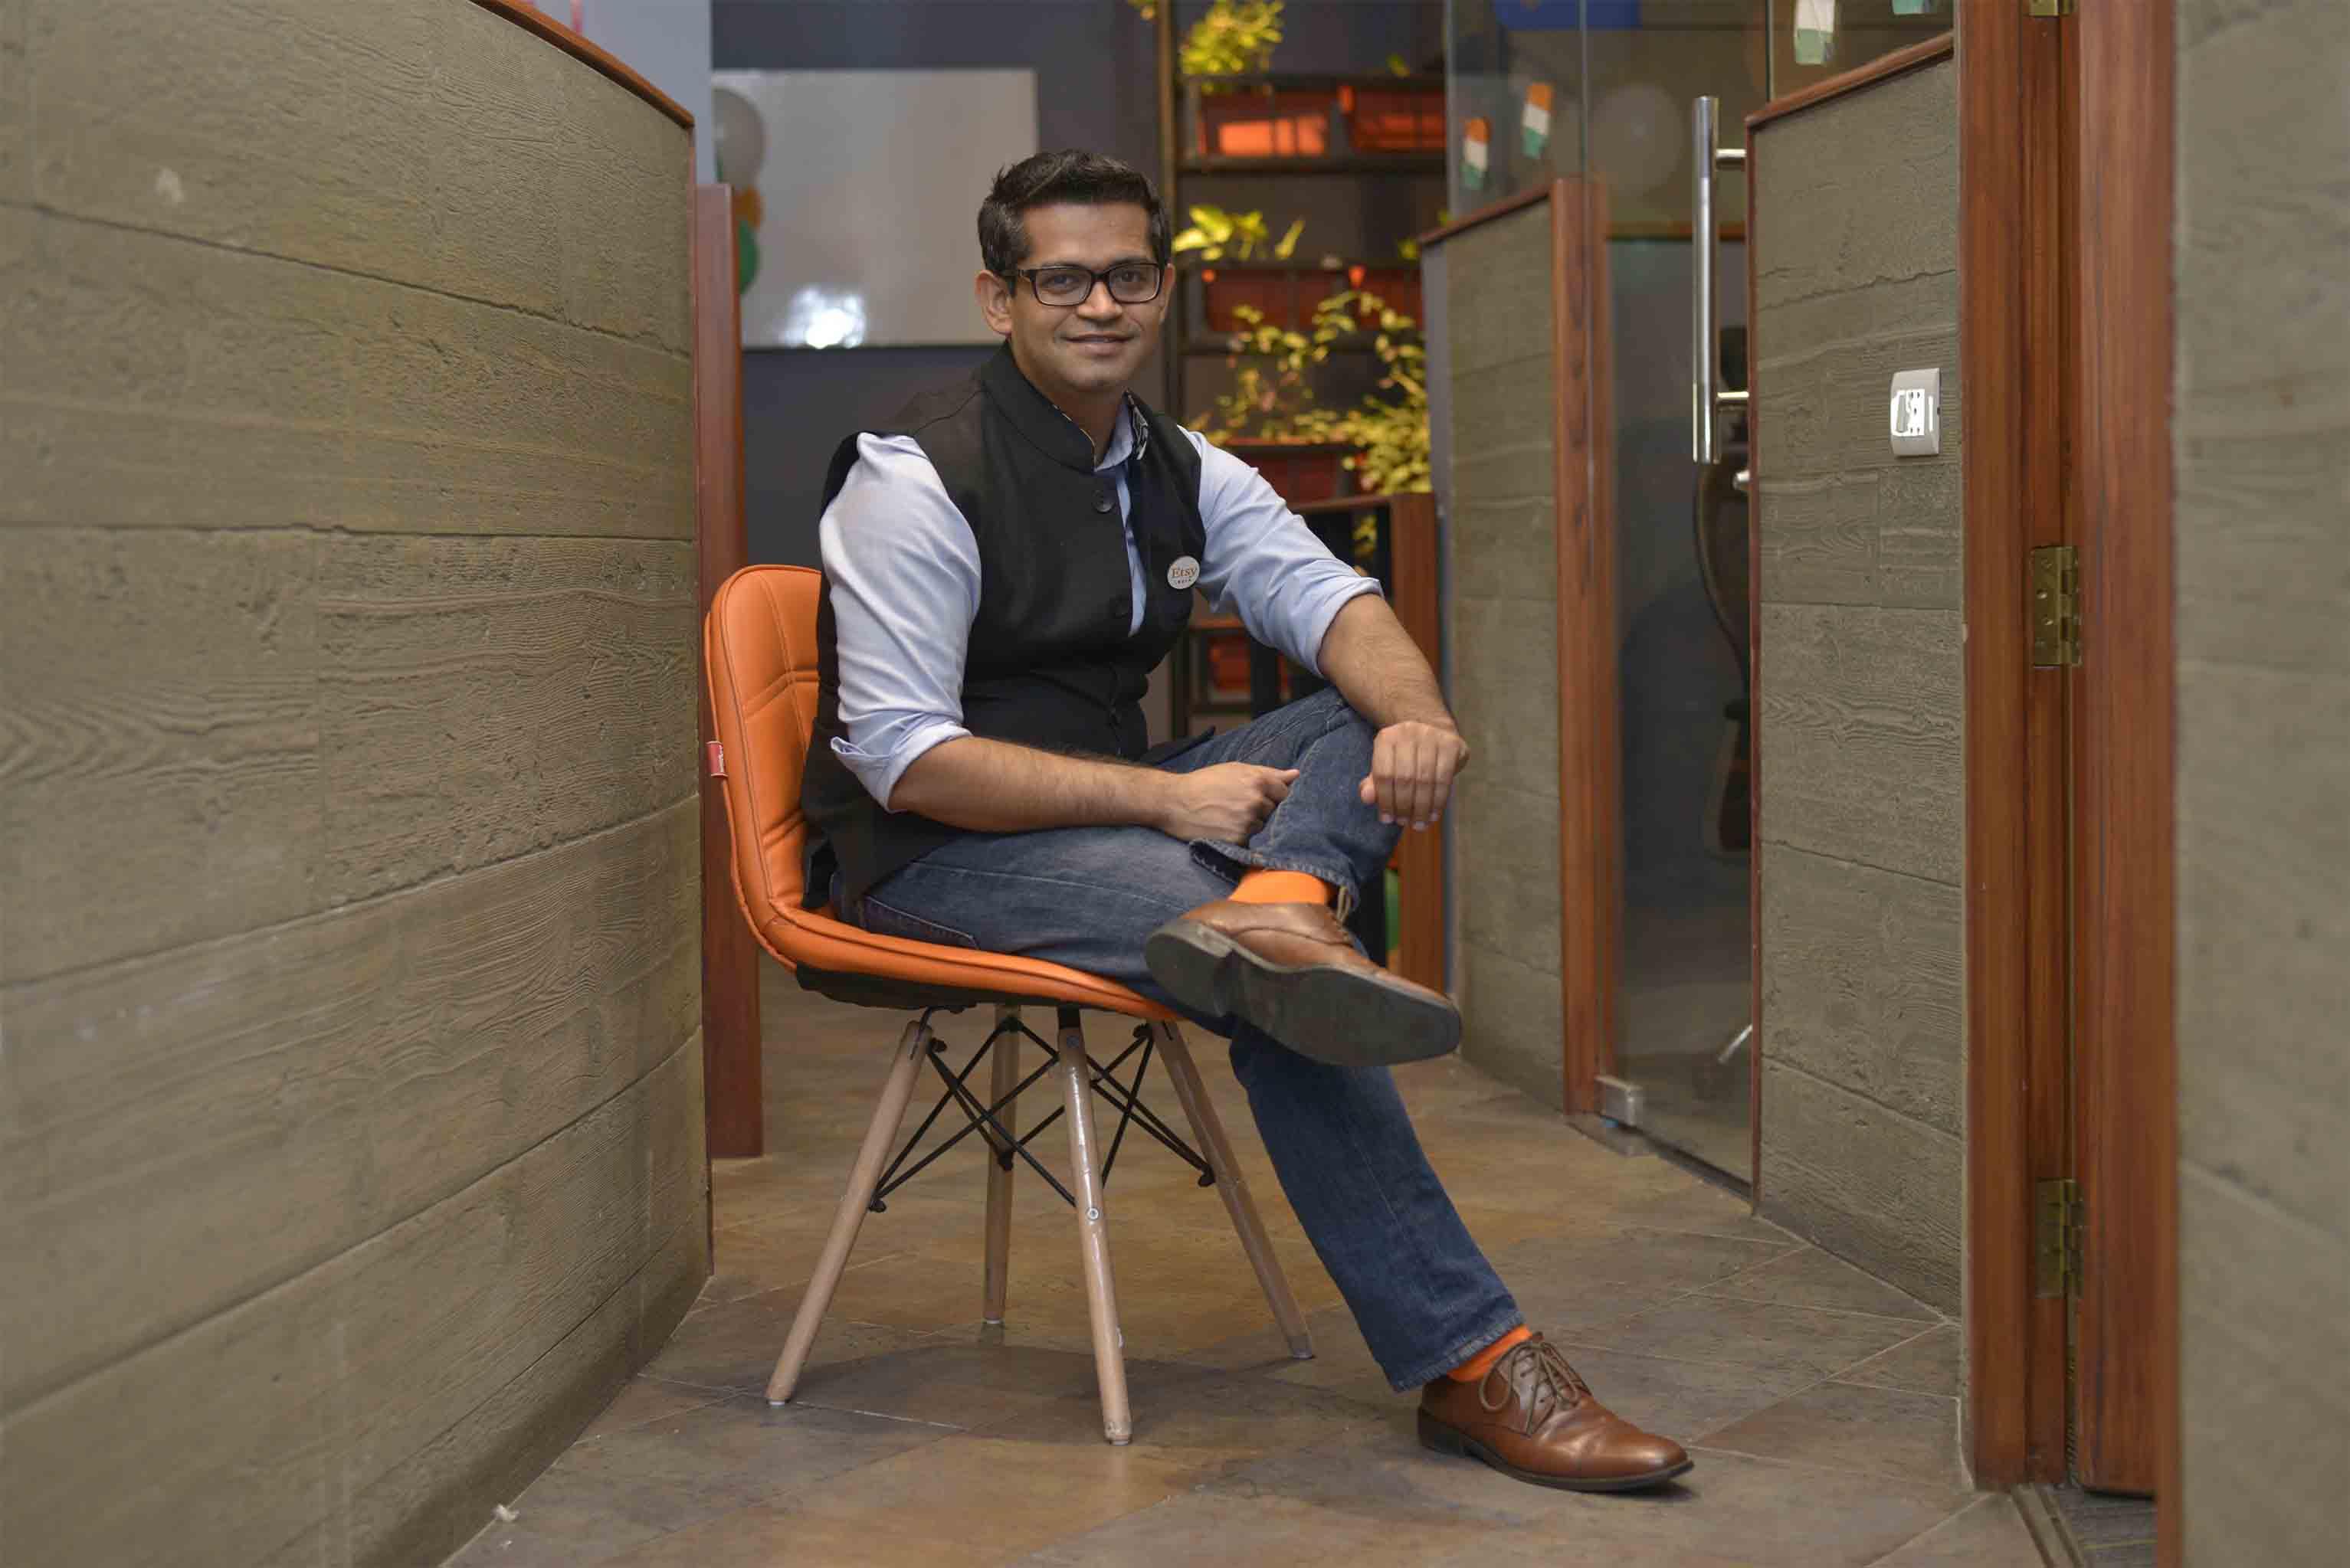 Artisans, Craftsmanship, E-Commerce, Etsy, Etsy India, Featured, Himanshu Wardhan, Online Exclusive, Shopping